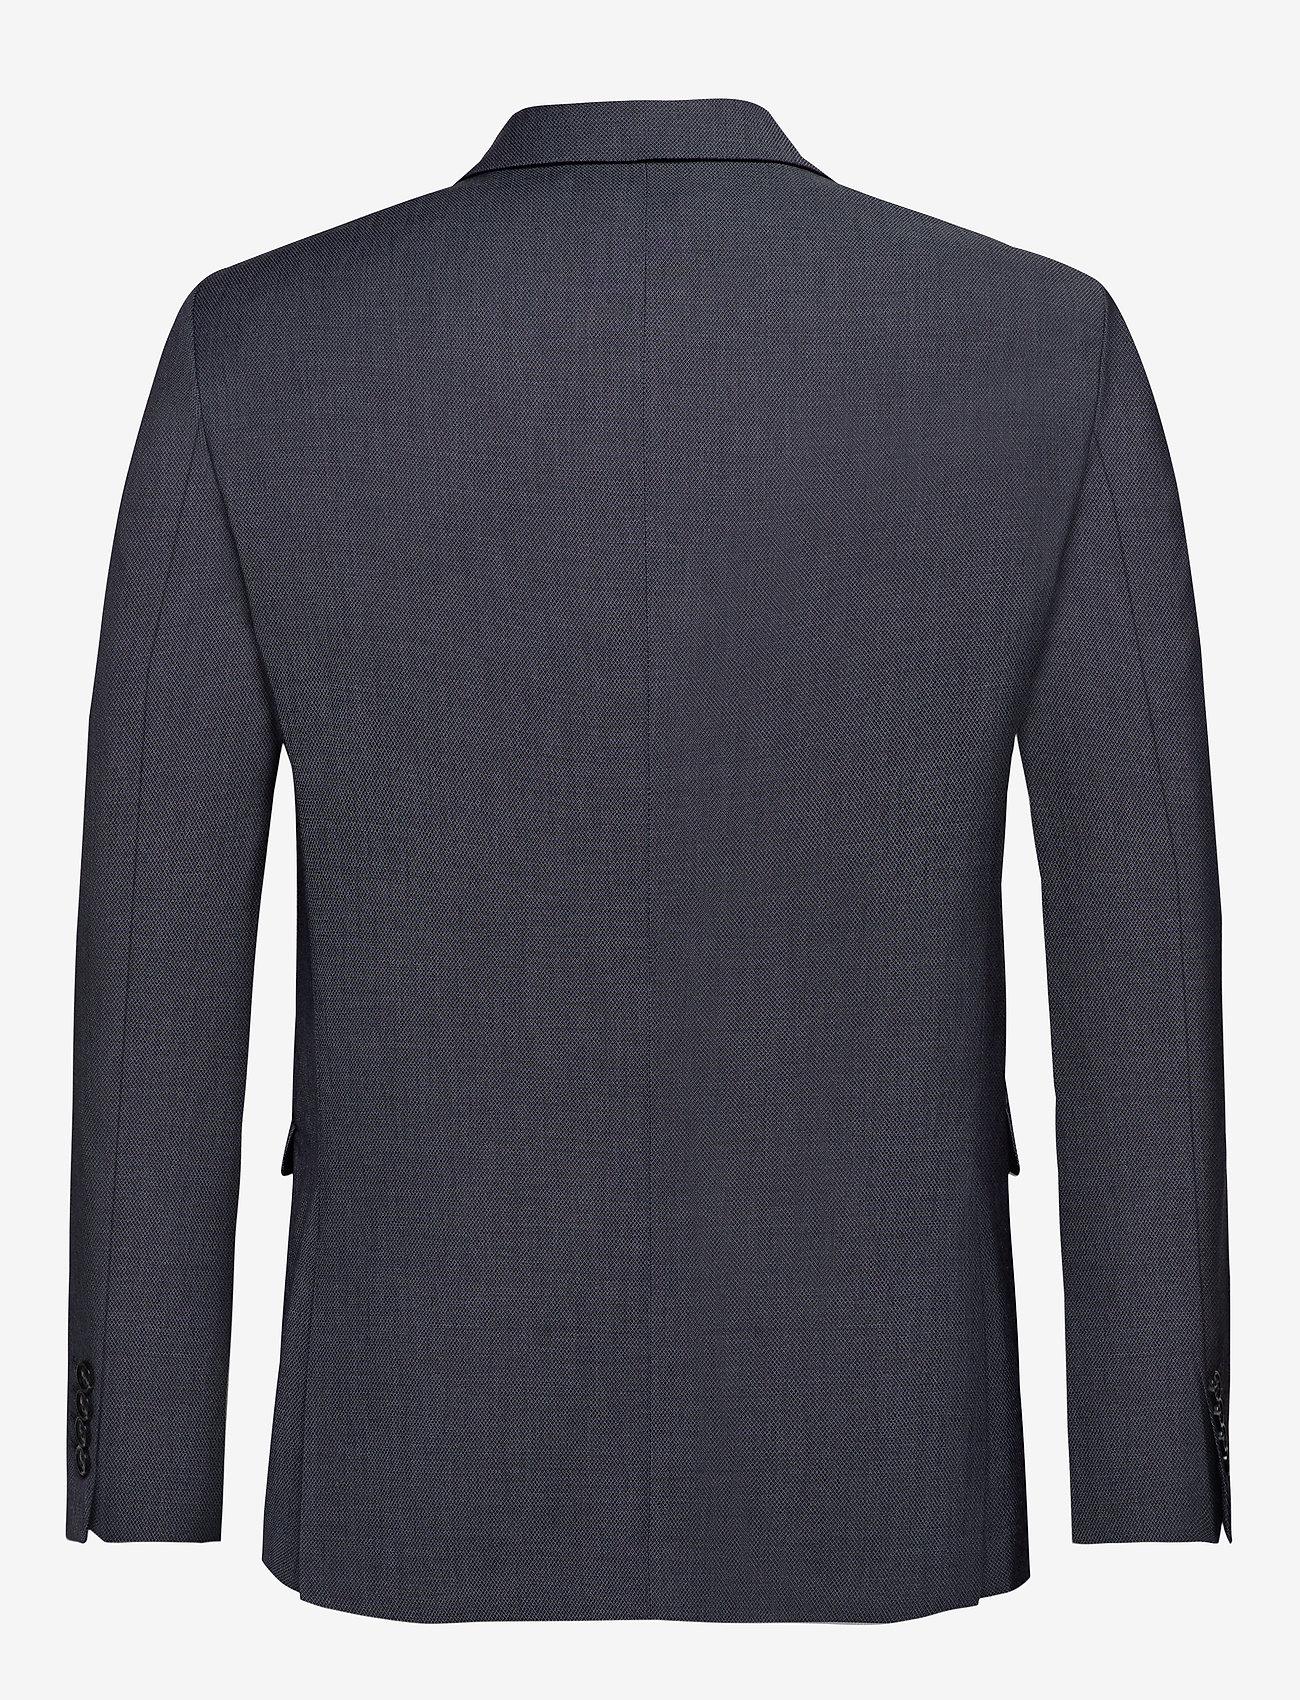 Selected Homme - SLHSLIM-MYLOBILL LT BLUE STRC BLZ B NOOS - single breasted blazers - light blue